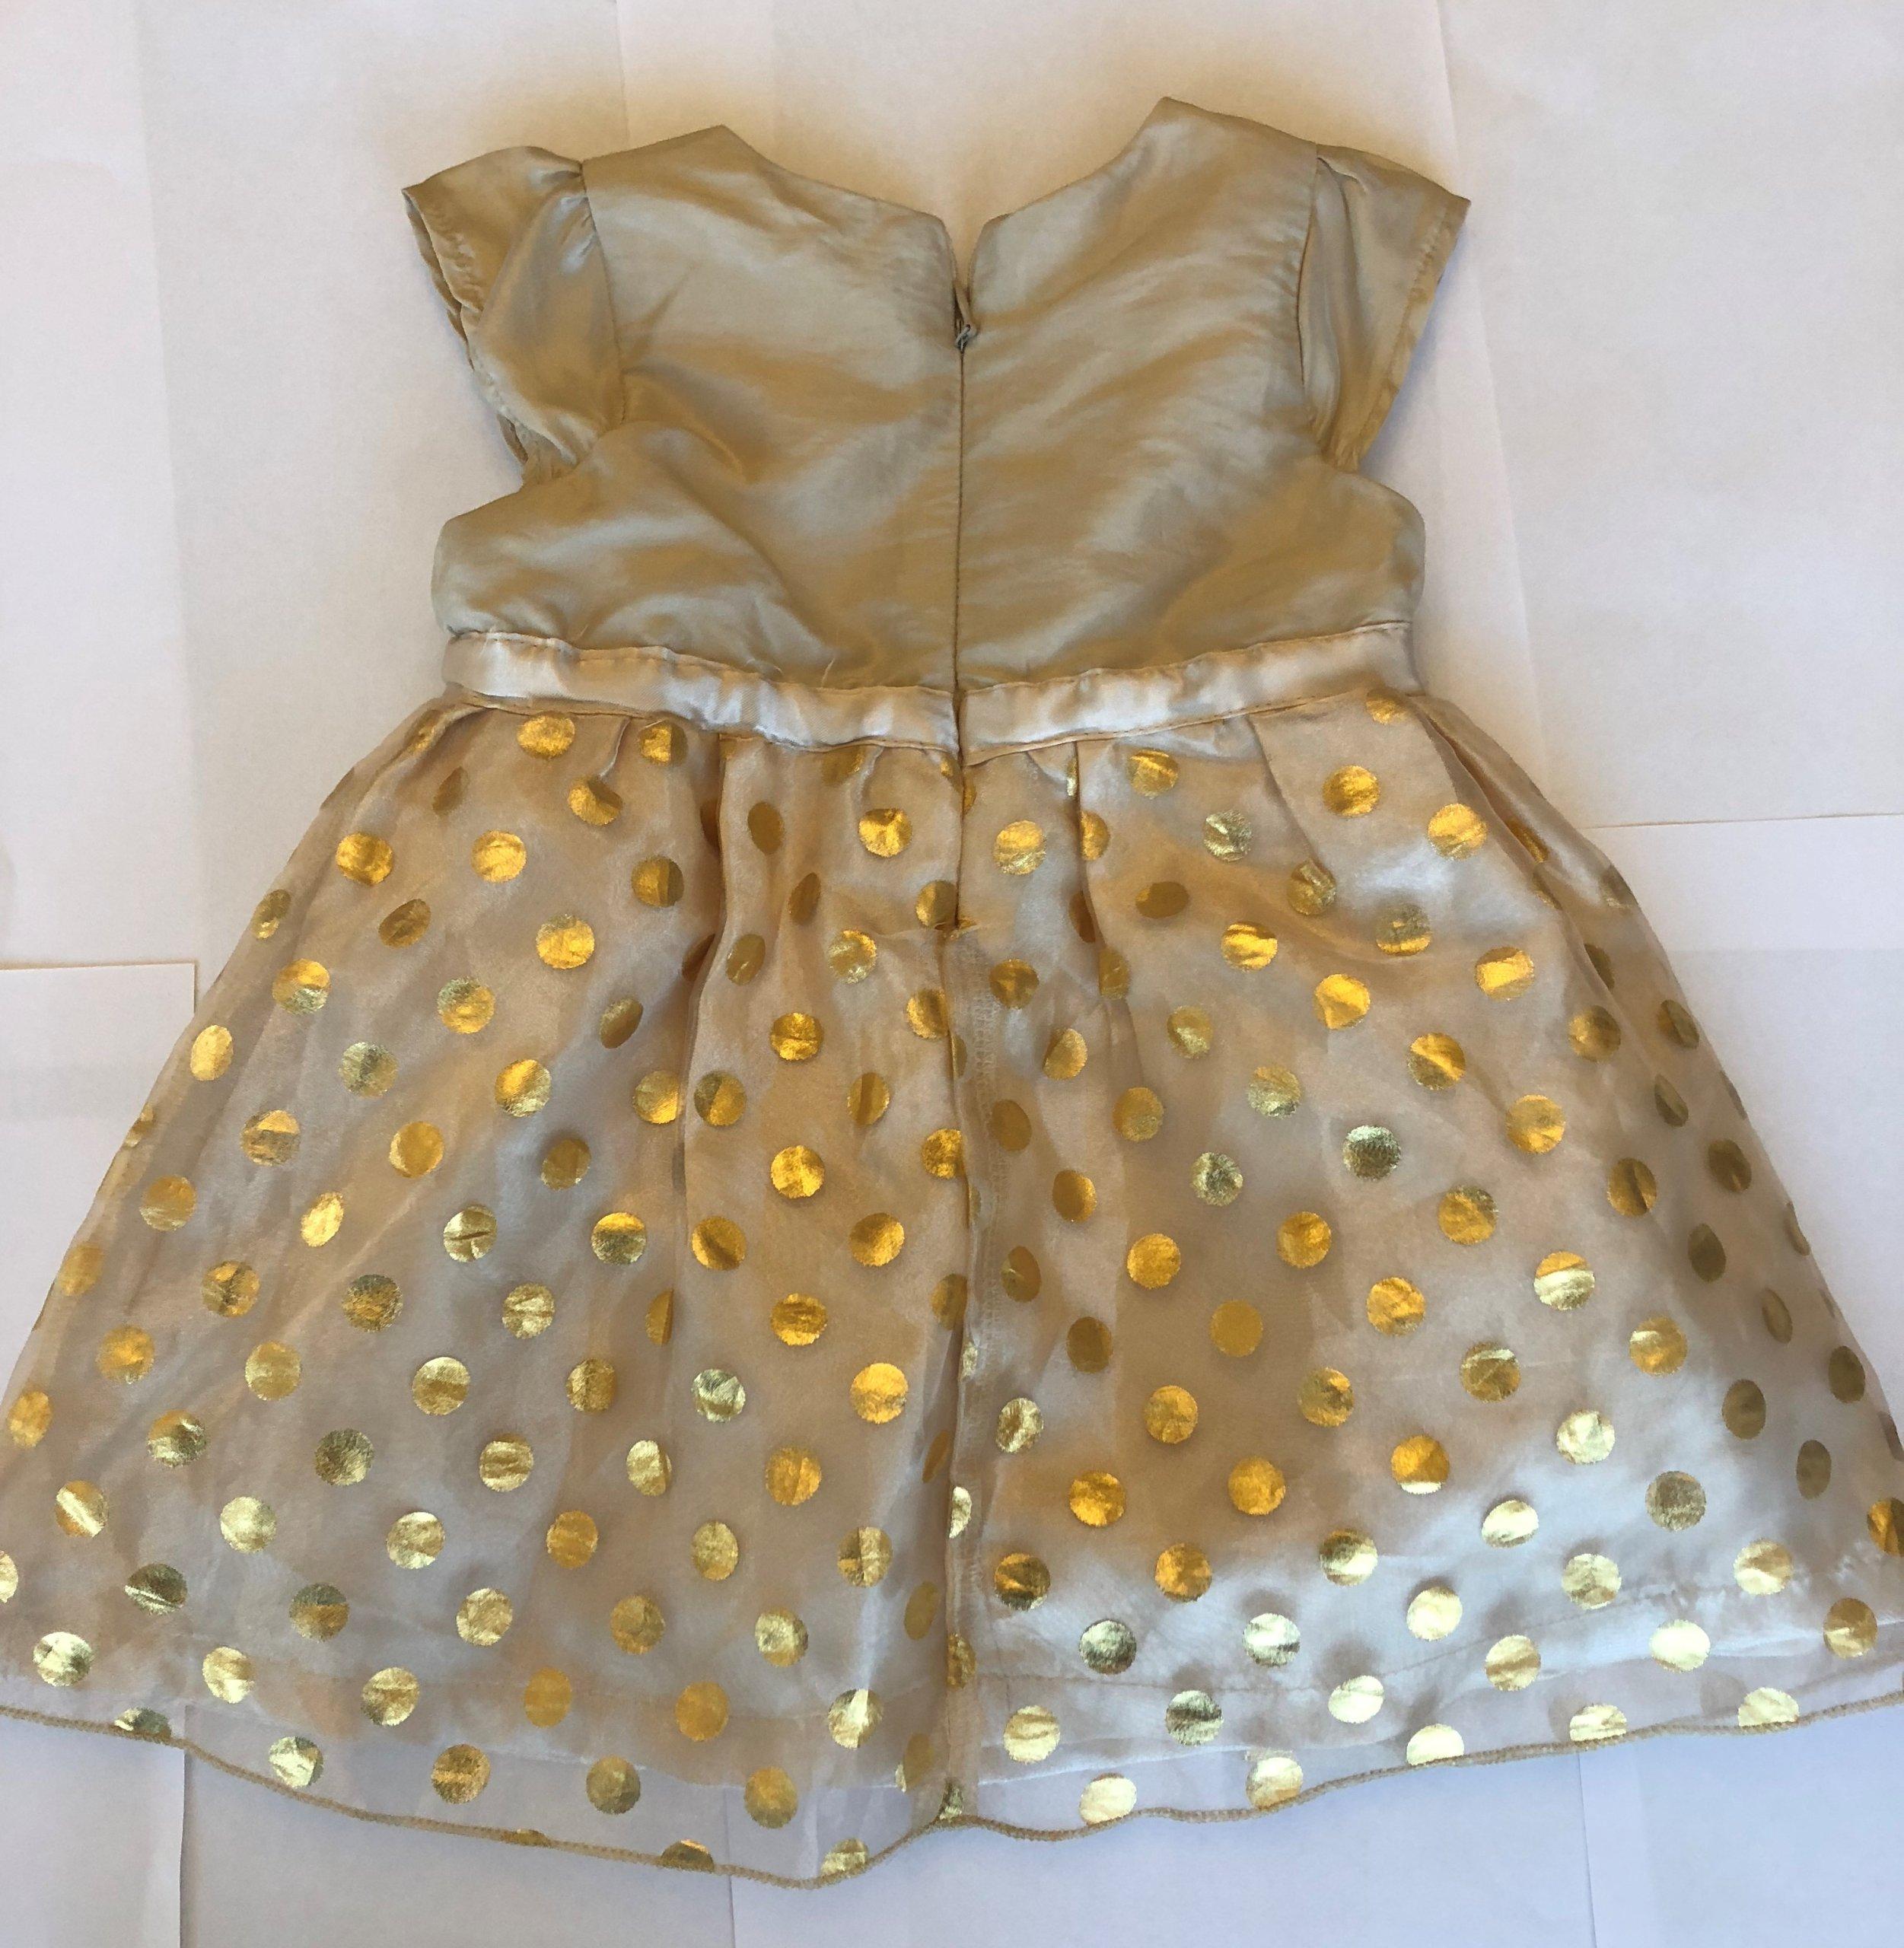 f9d09ce87a Elegancka wizytowa sukienka 5.10.15 r. 74 jak NOWA - 7362248137 ...